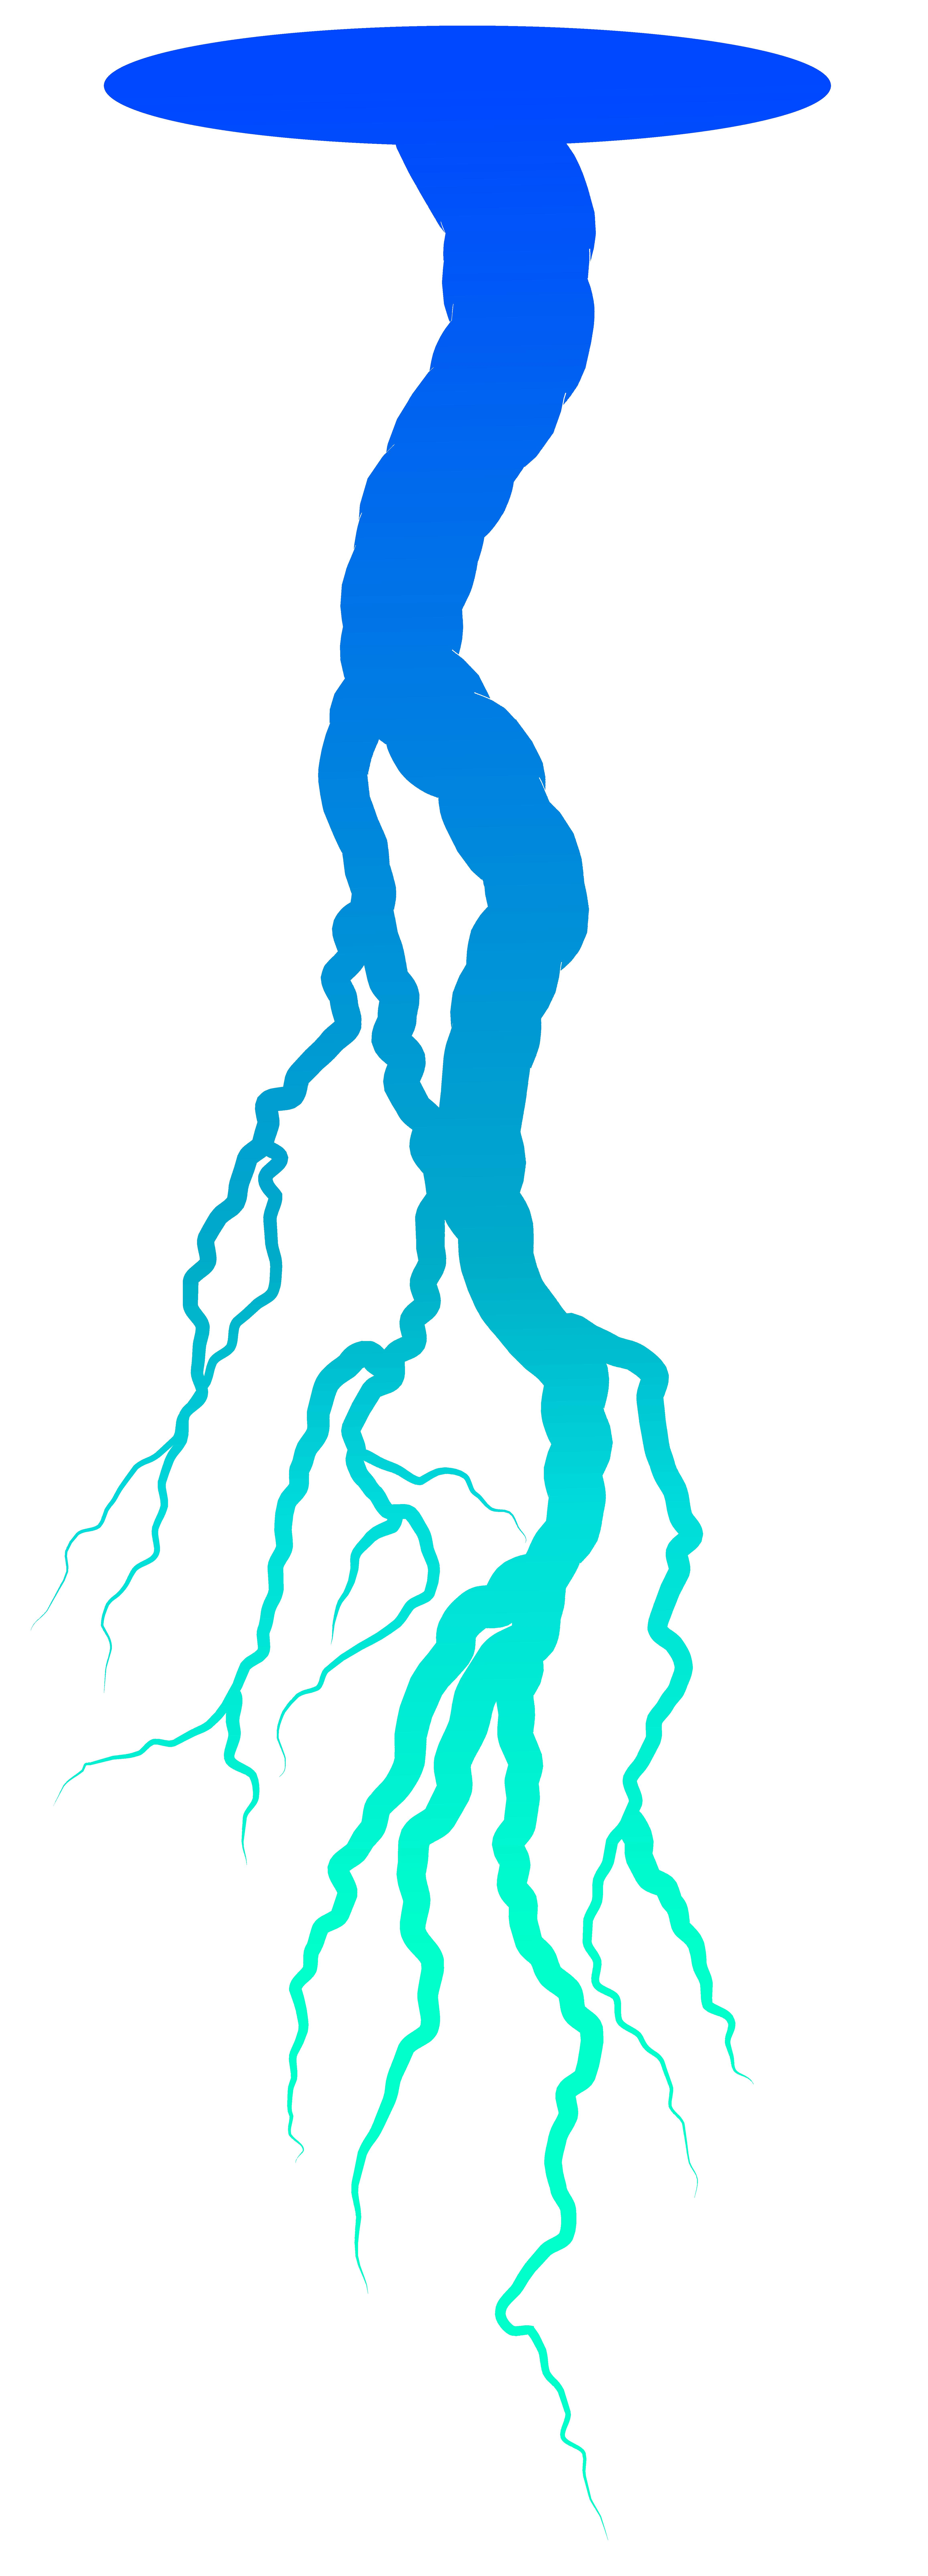 Bug at getdrawings com. Lightning clipart lightning shock